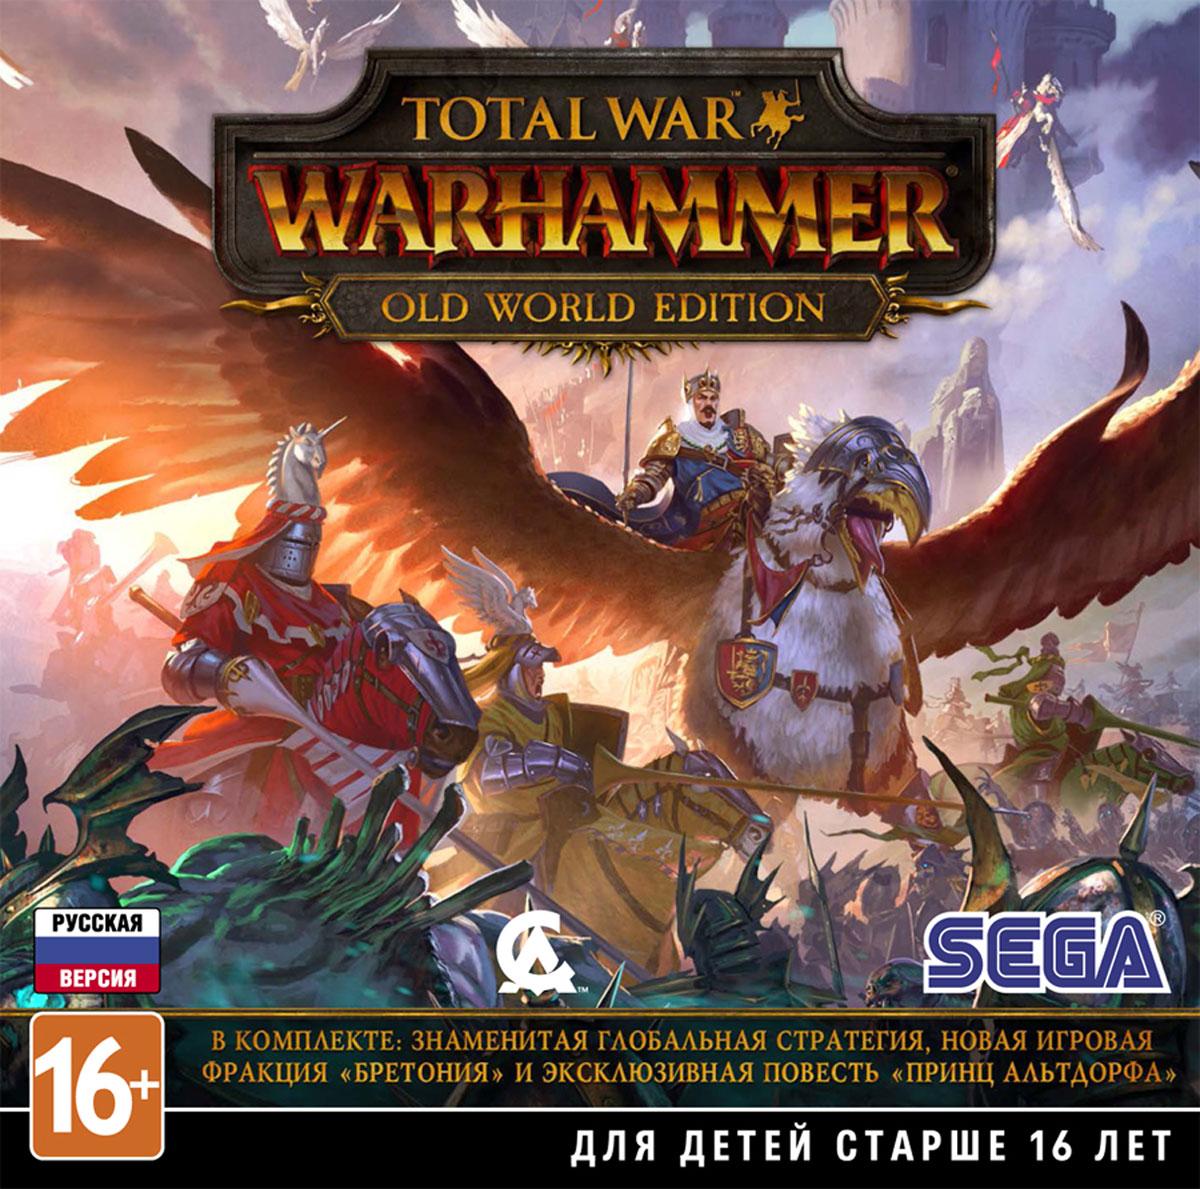 Total War: Warhammer. Old World Edition